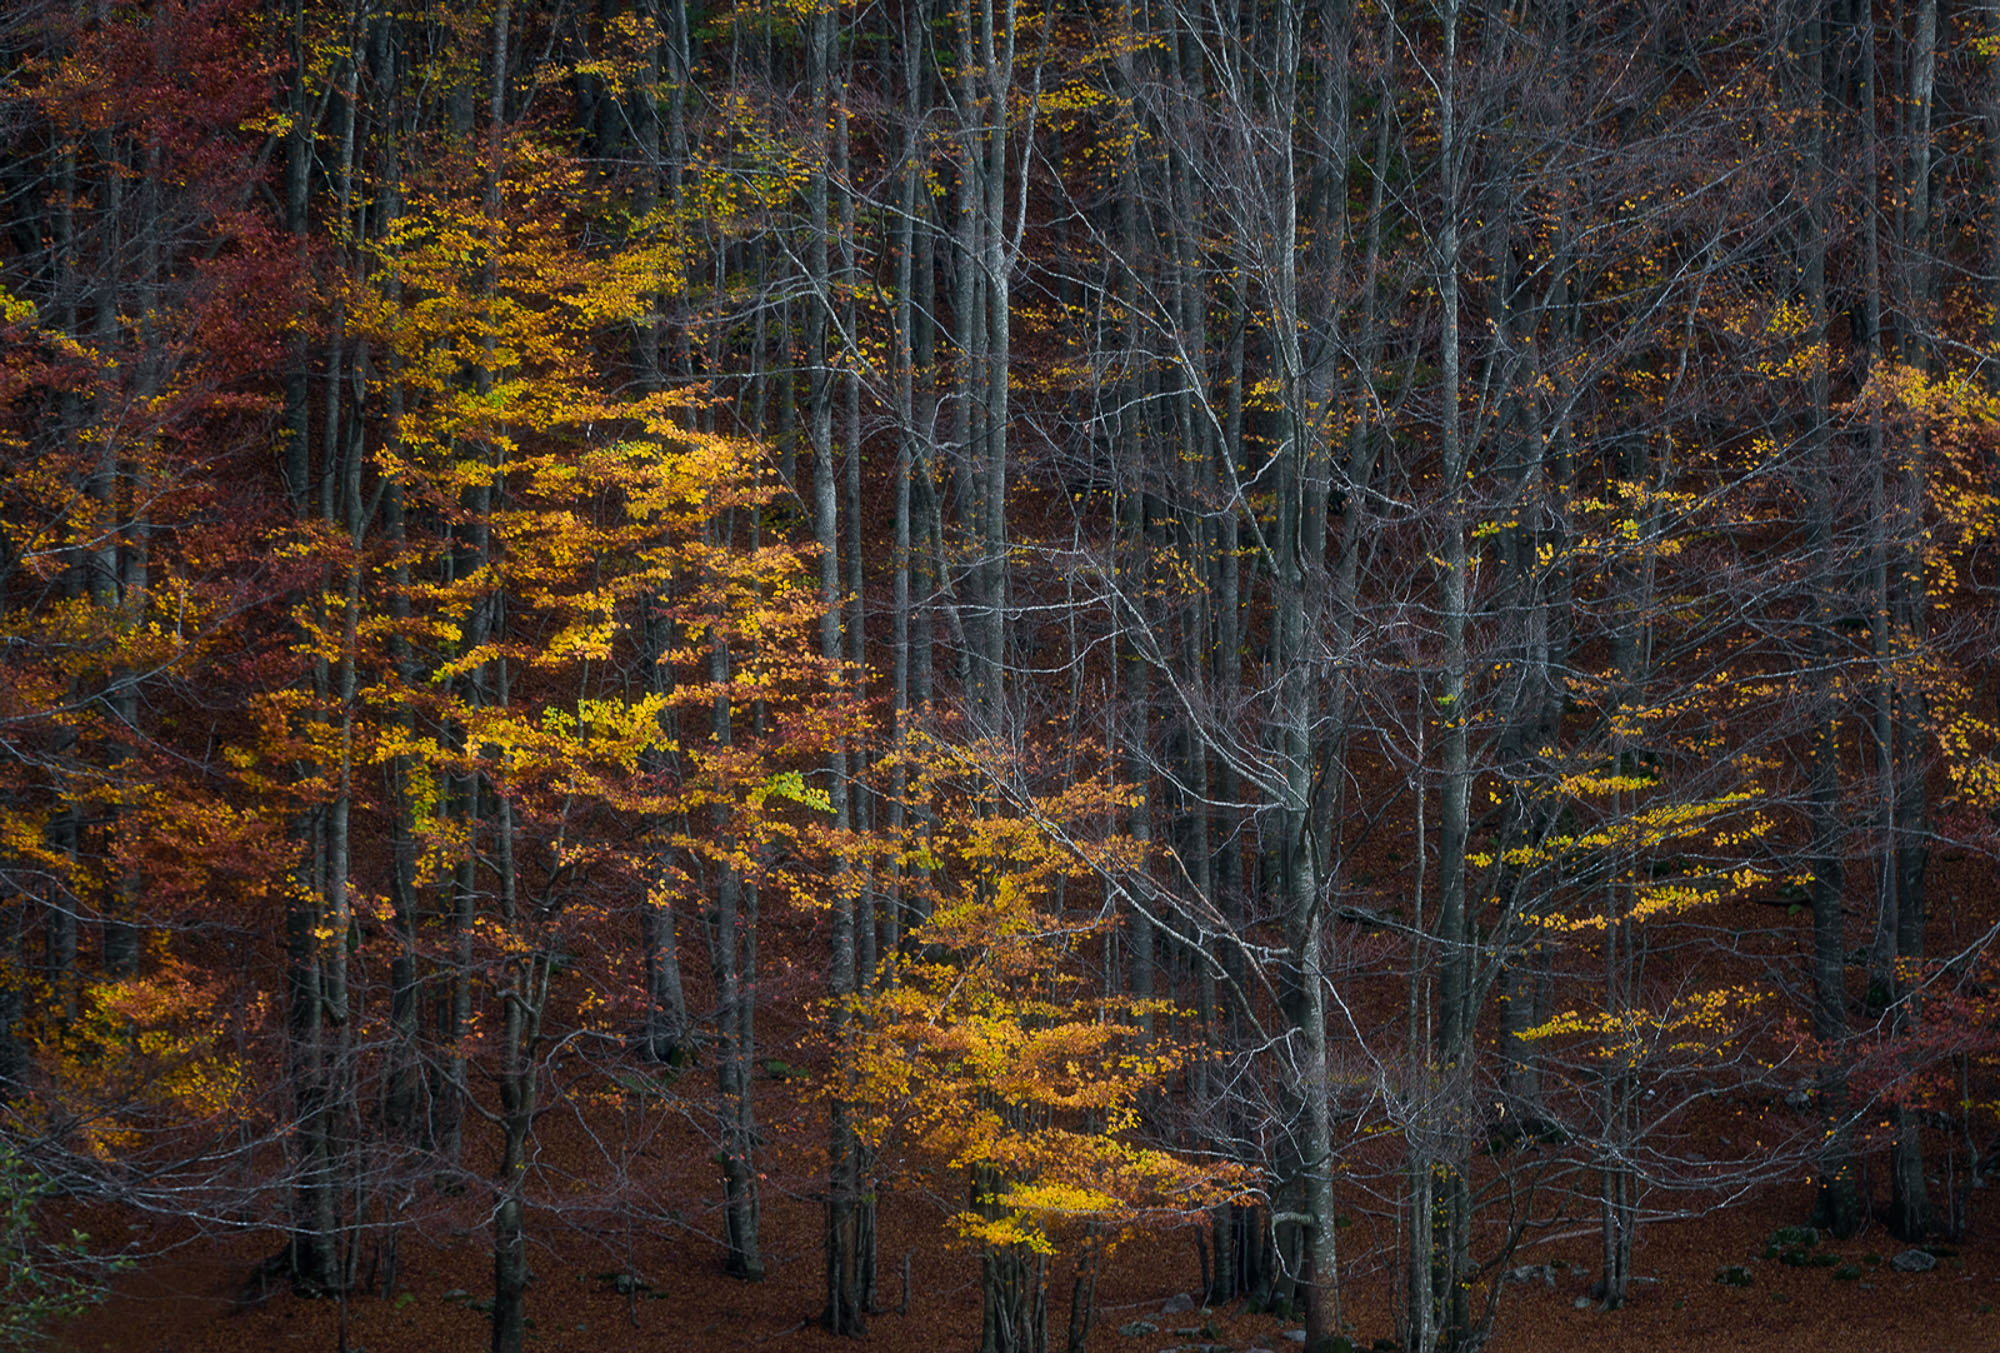 Foliage Apuane Emanuele Baroncelli